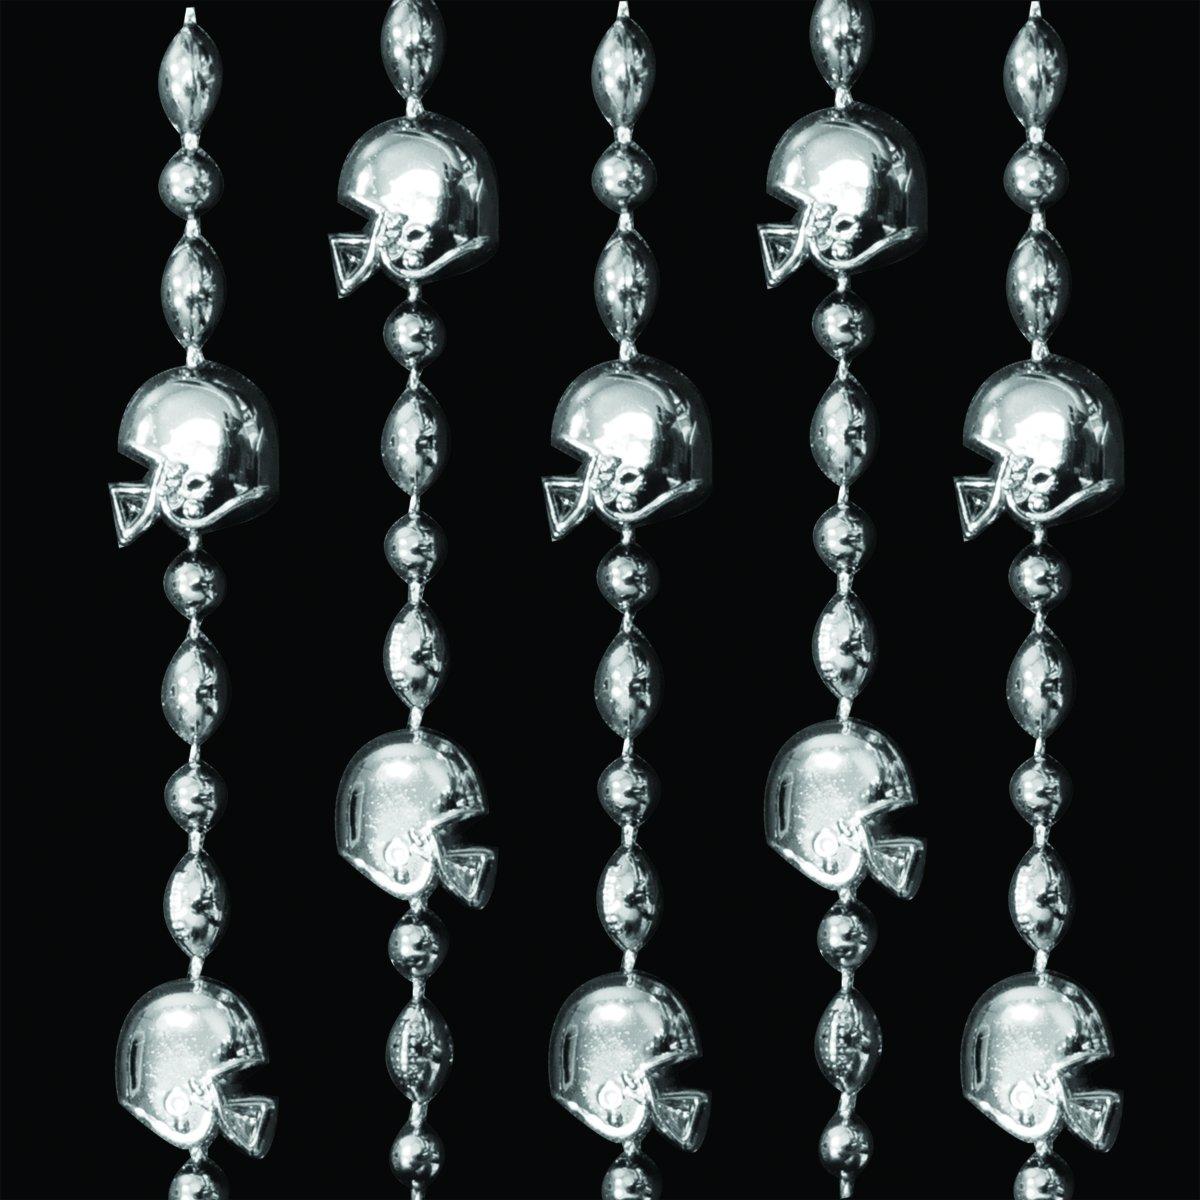 FlashingBlinkyLights Silver Football Helmet Mardi Gras Bead Necklaces (Set of 72)